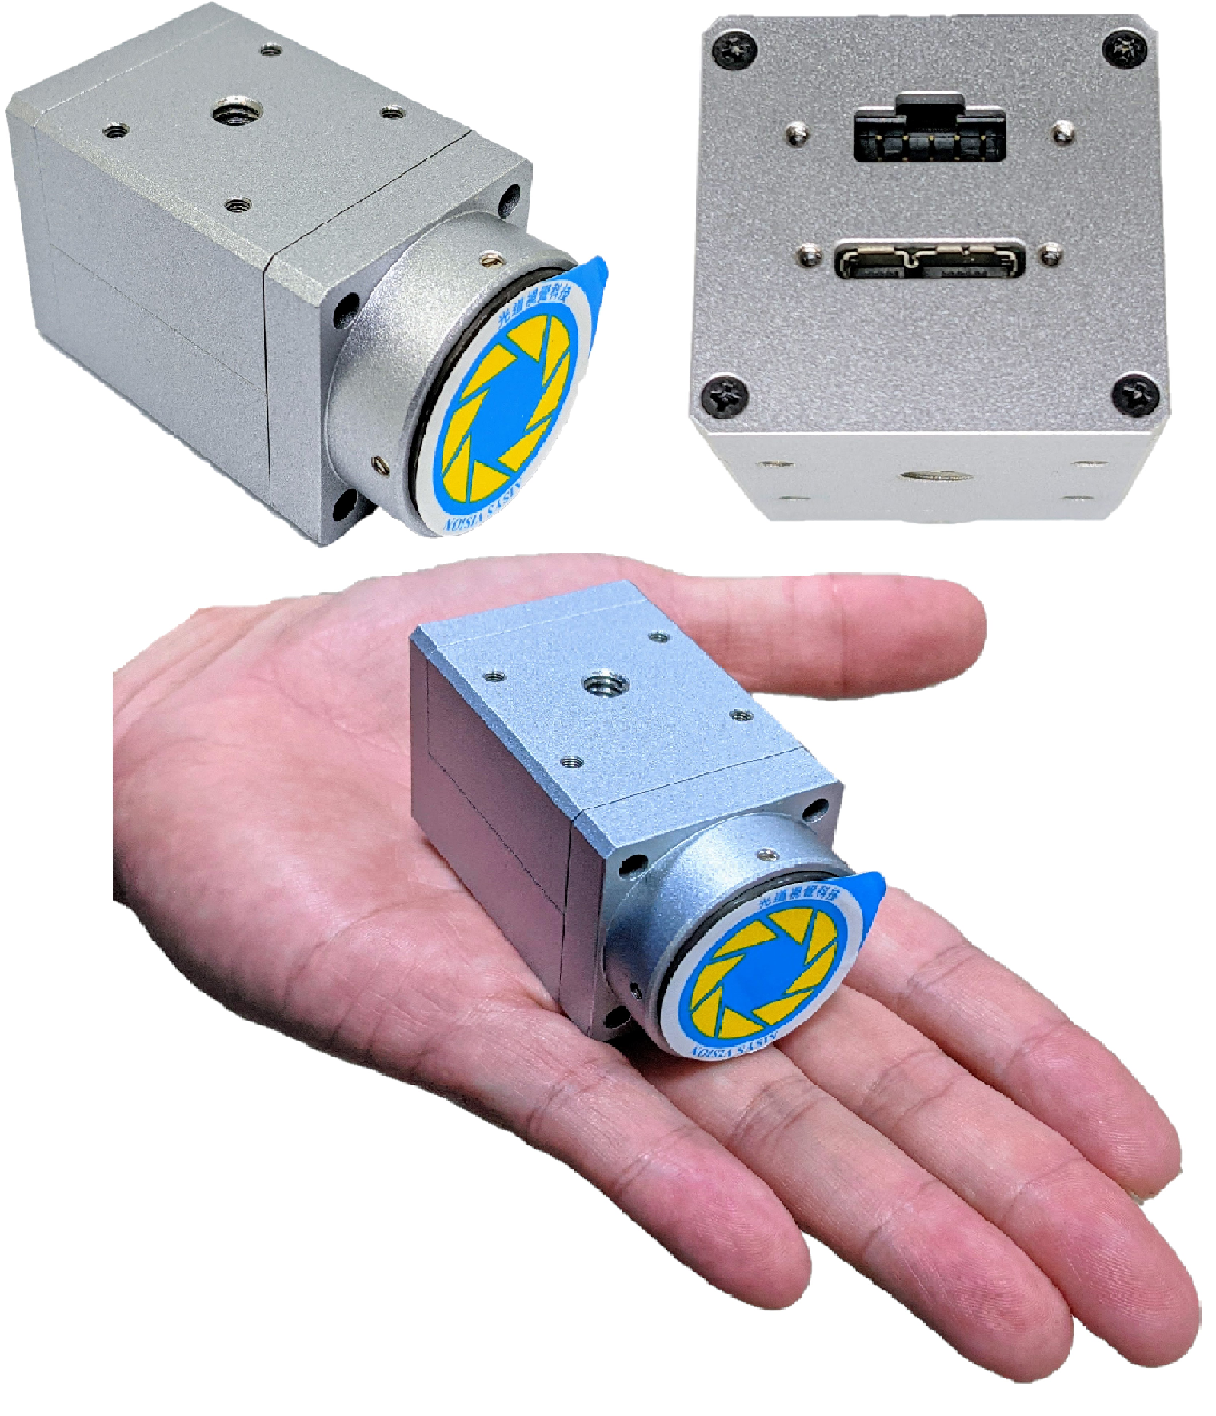 CYCLOPS SU220FC-152攝影機-2.2M像素、非同步式、彩色、內建LED燈源控制器